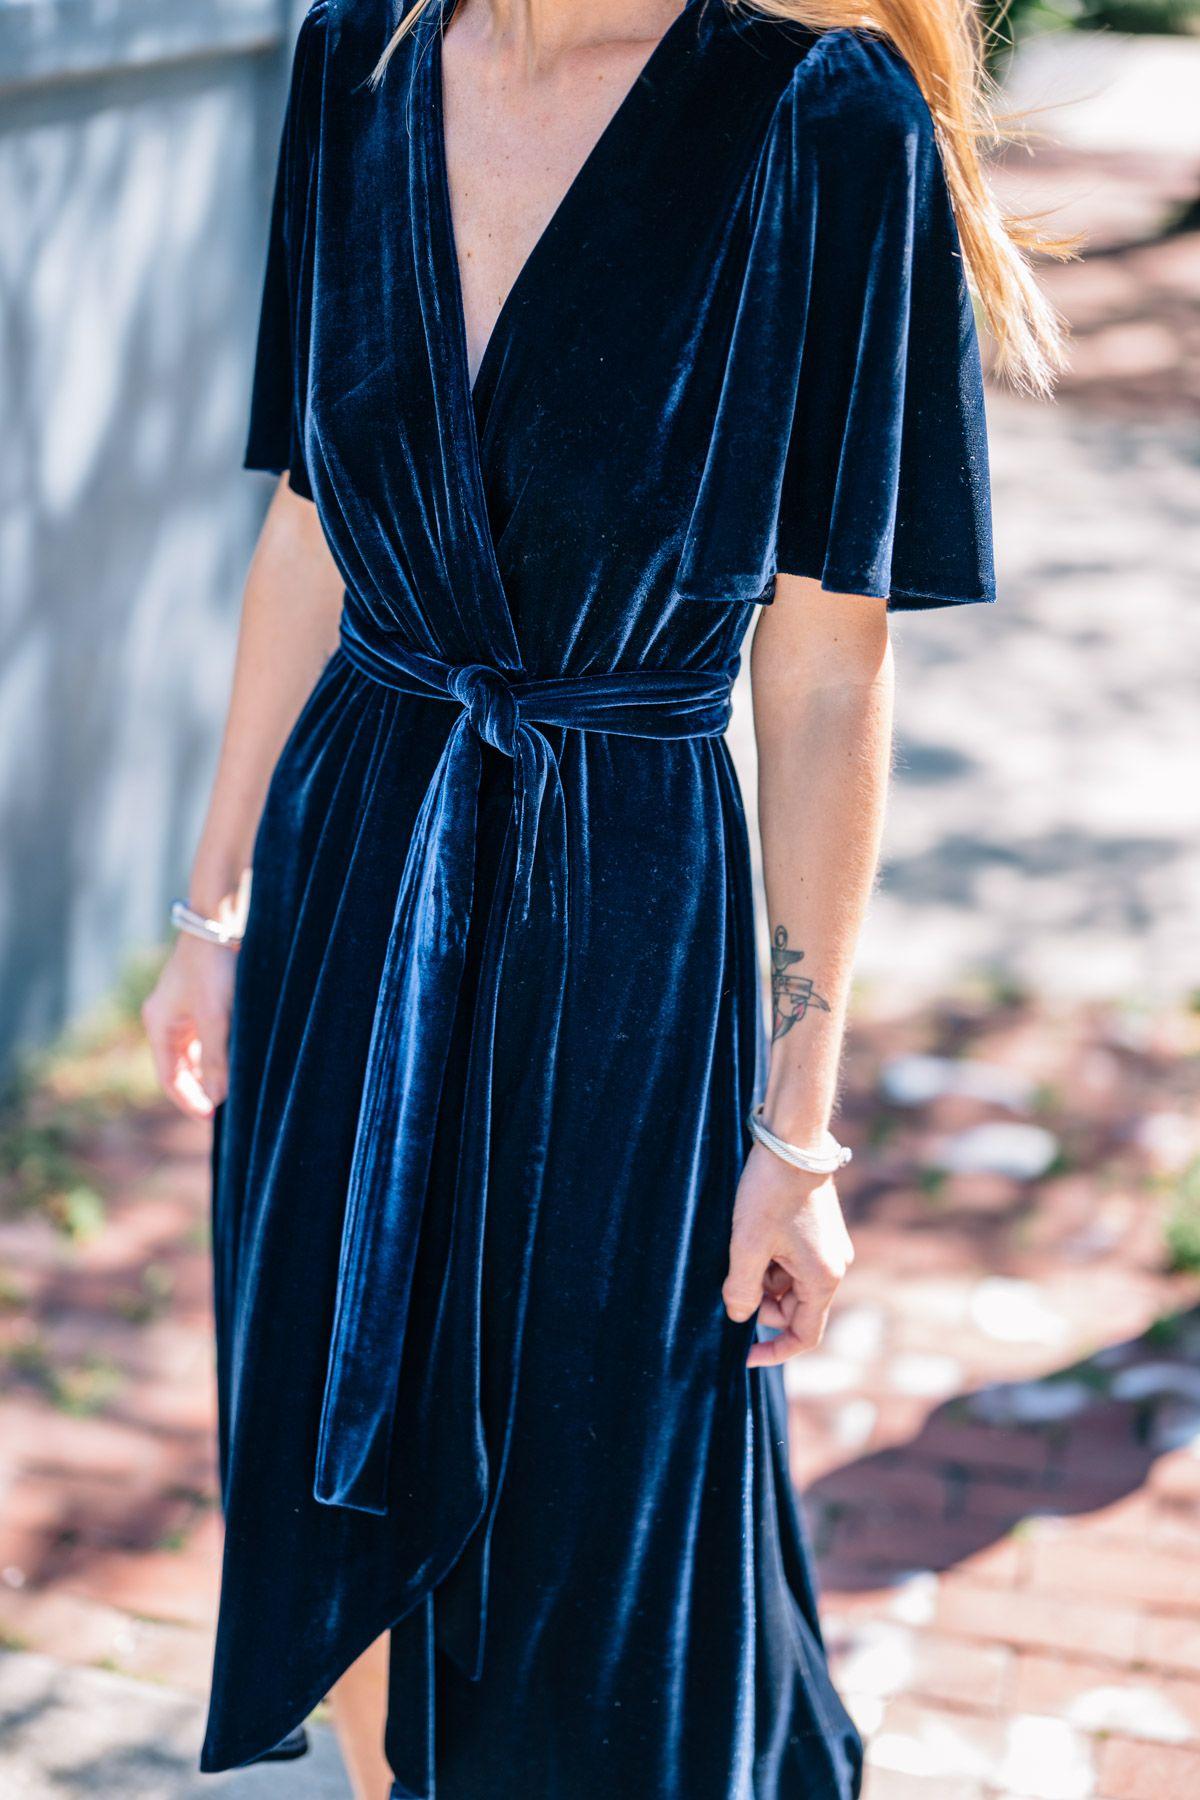 ab5d6c6210e11 Jess Ann Kirby styles a velvet wrap midi dress by Donna Morgan for a fall  wedding.